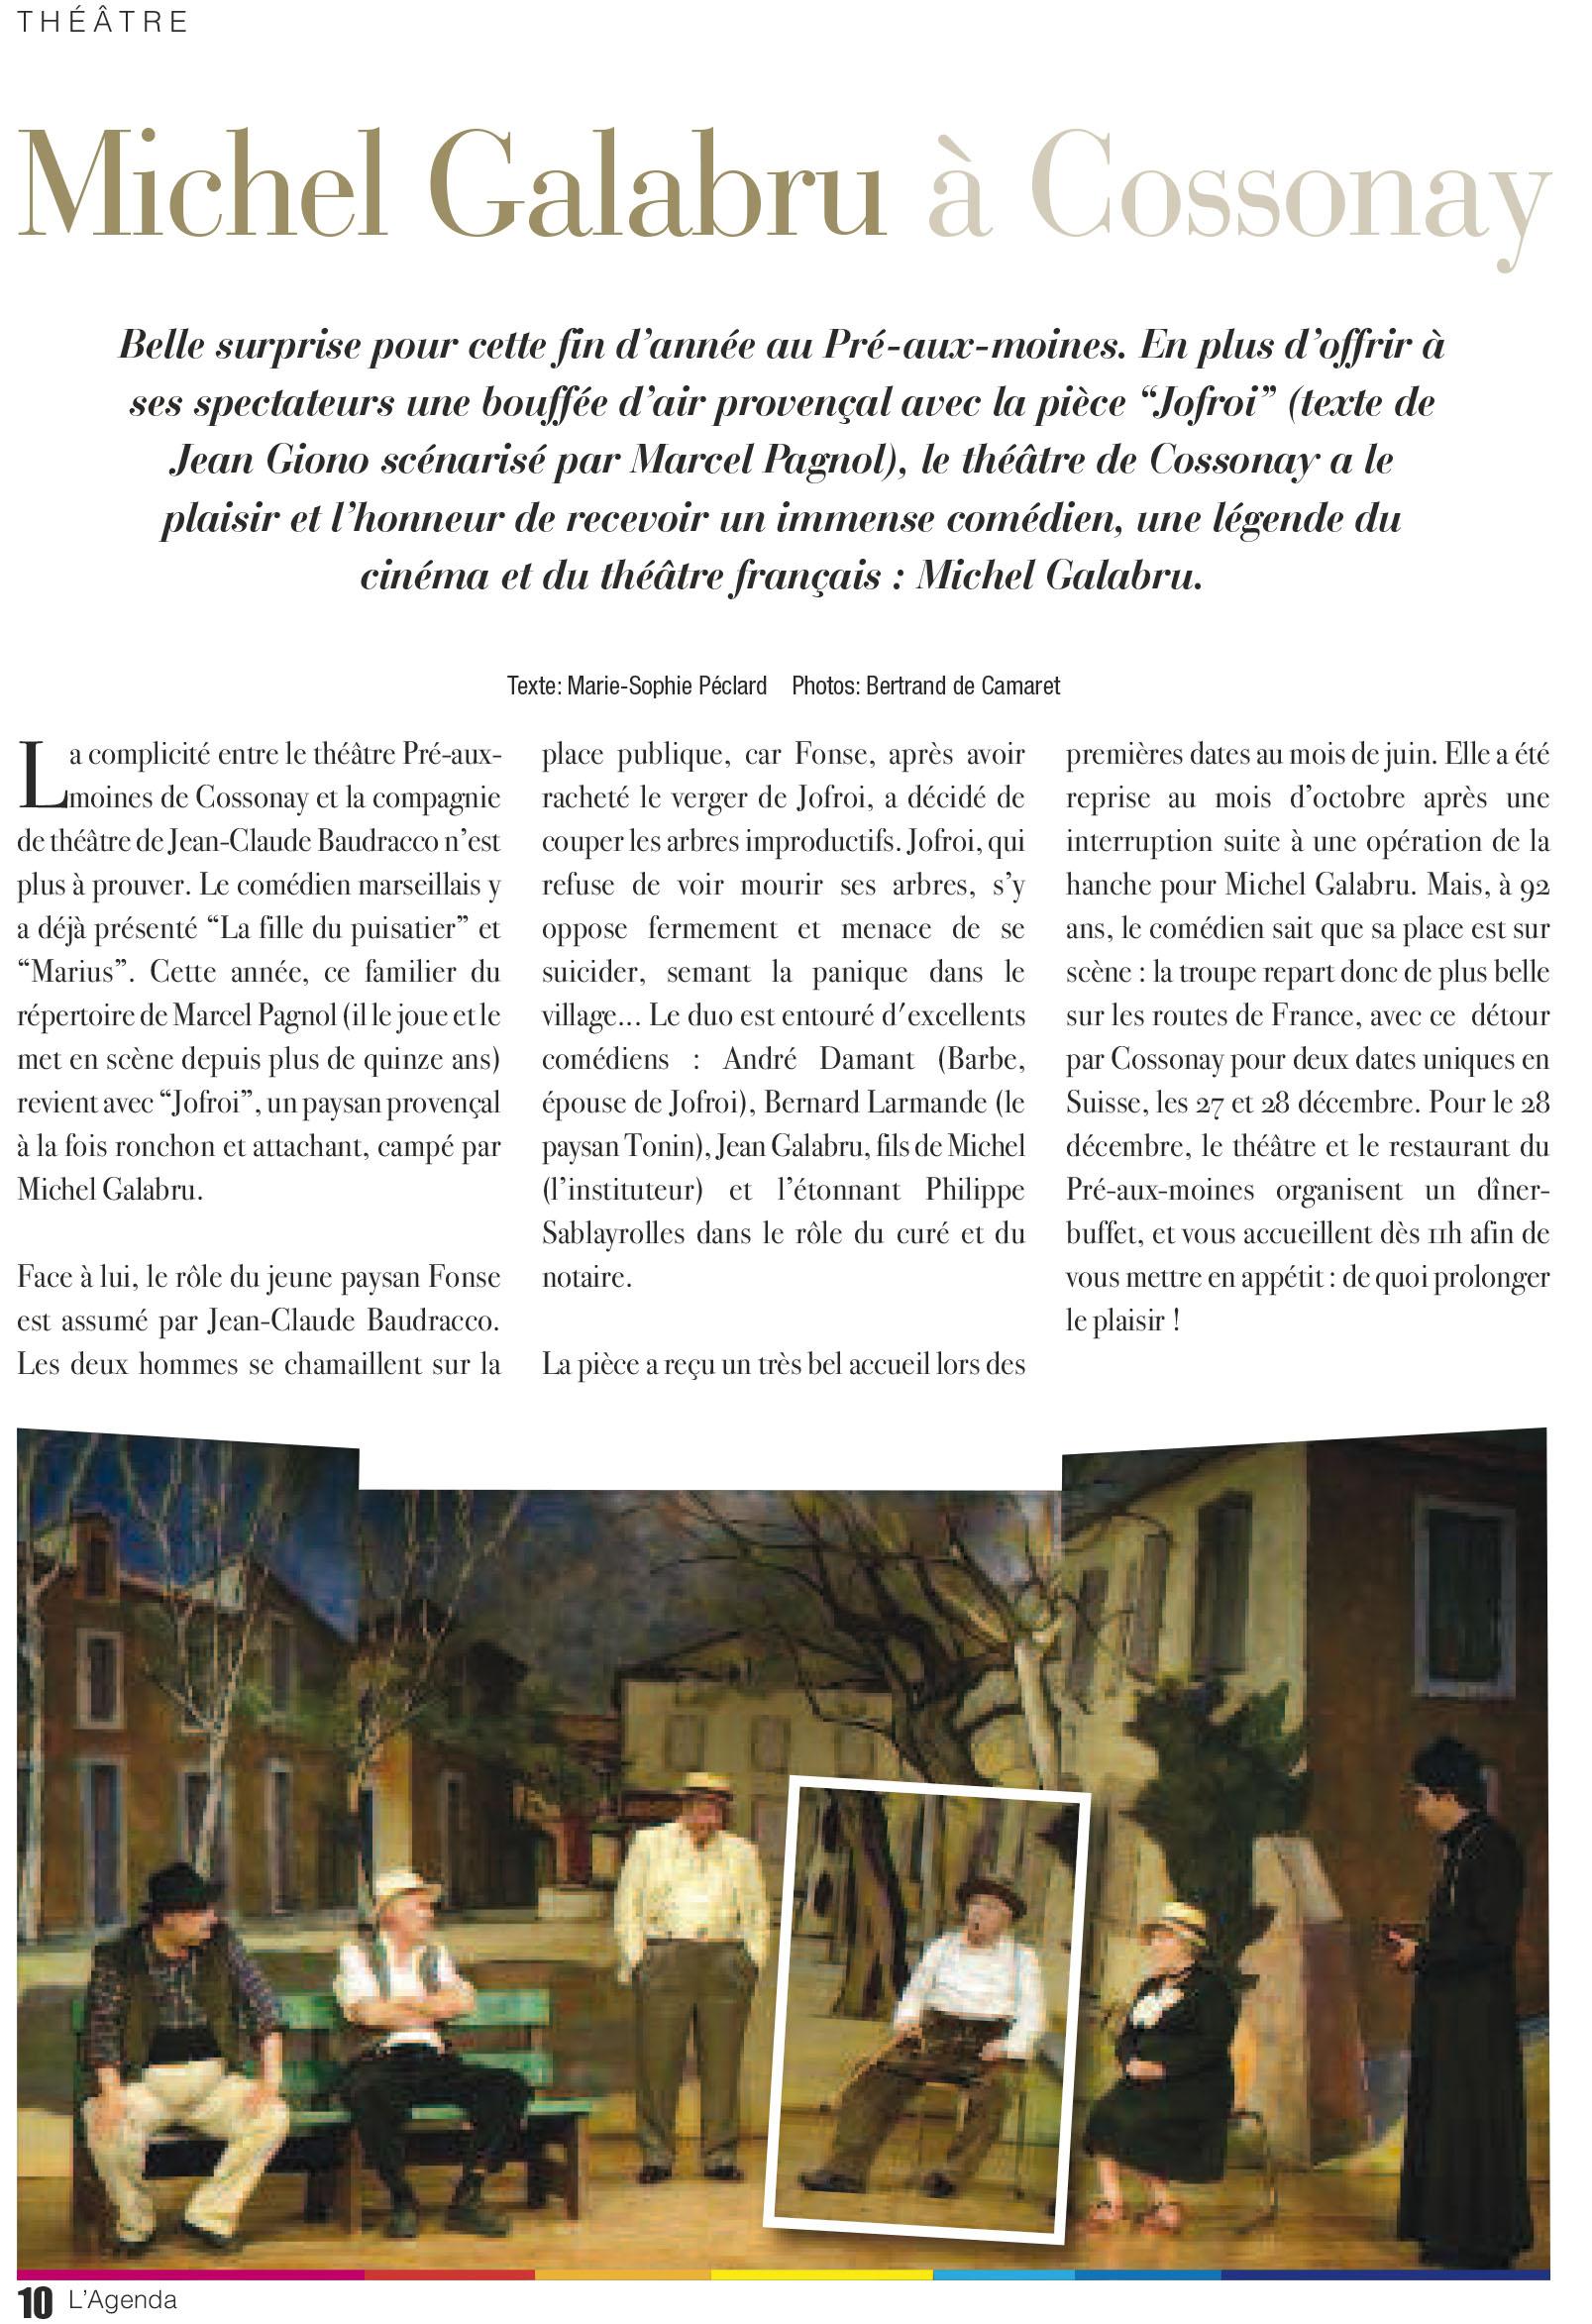 L'Agenda – La revue culturelle de l'Arc lémanique, No 55, novembre-décembre 2014